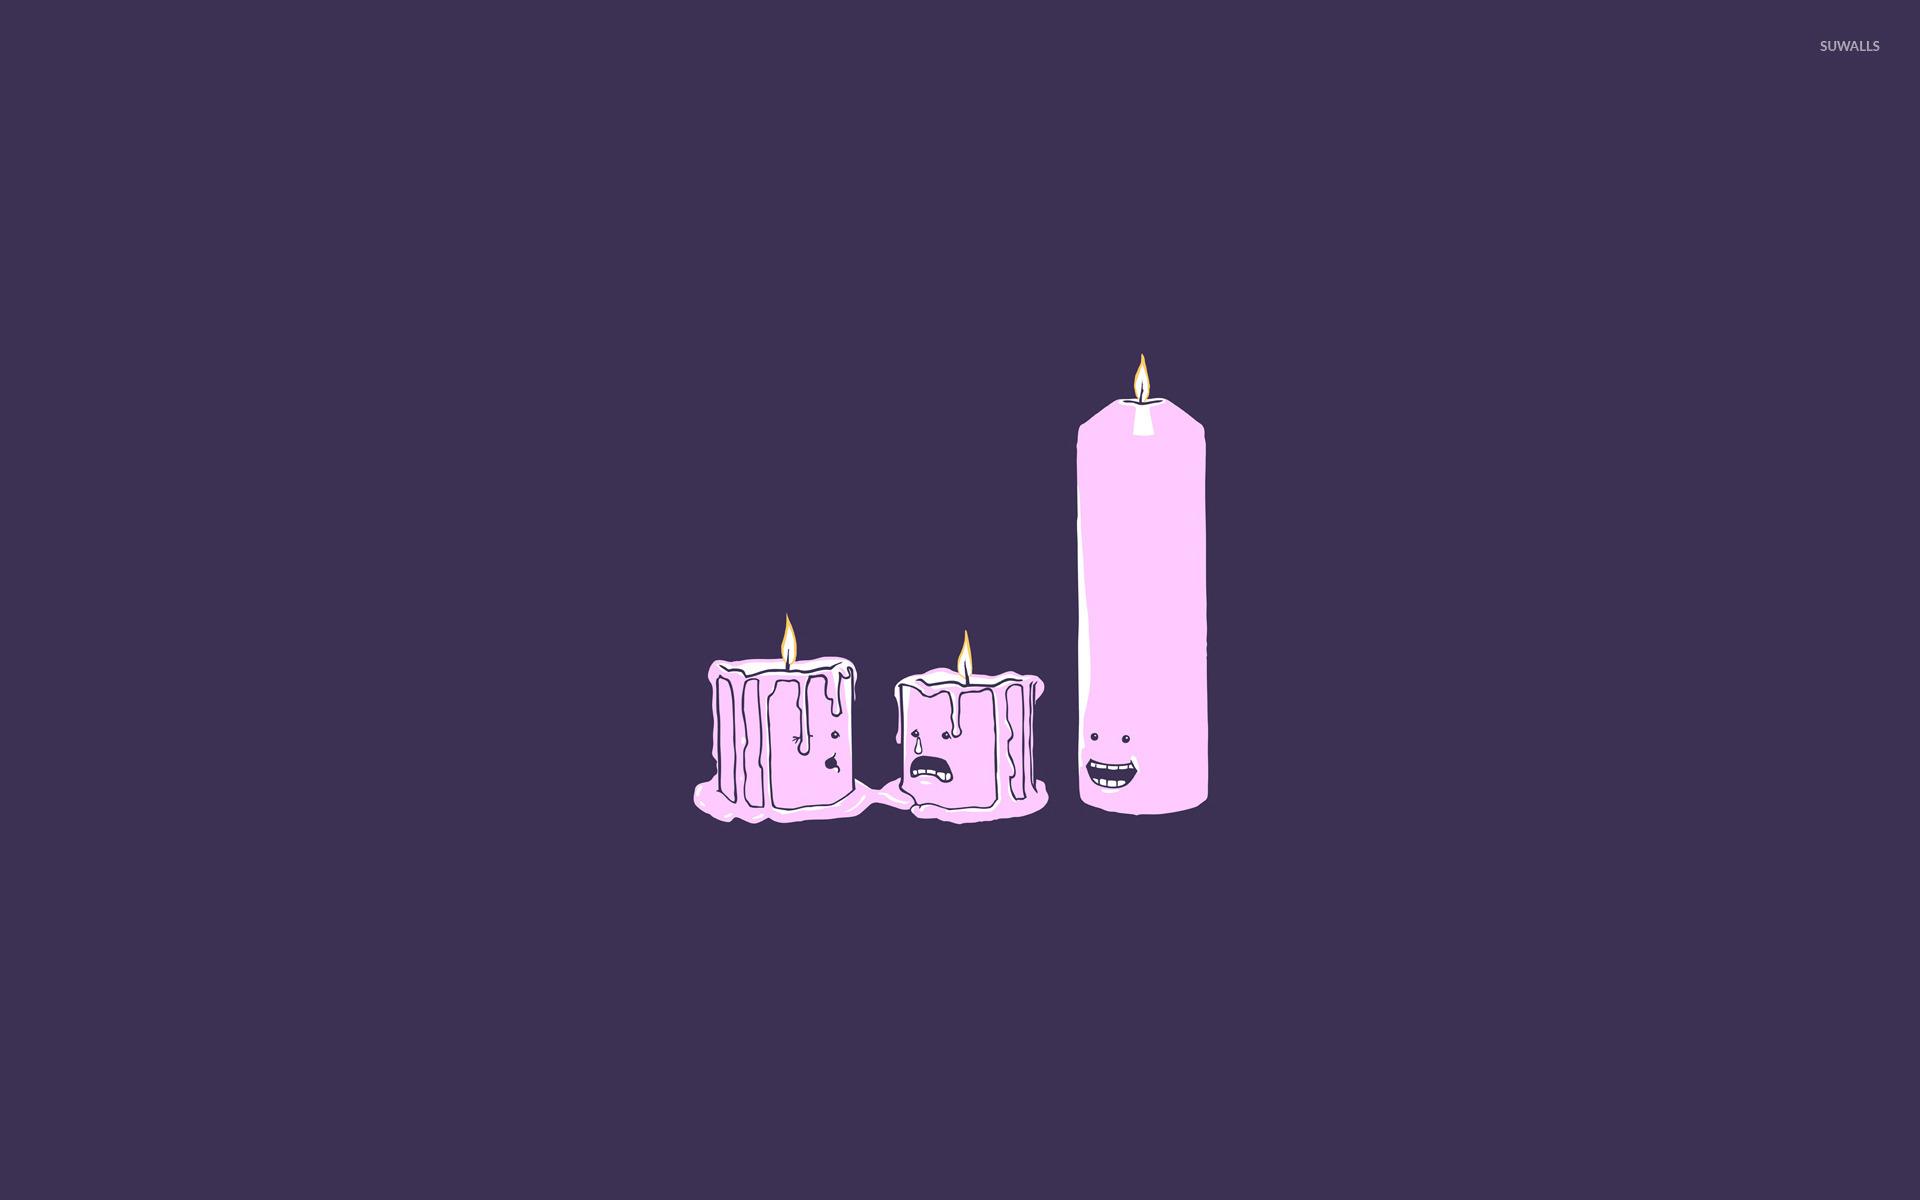 Melting candles wallpaper